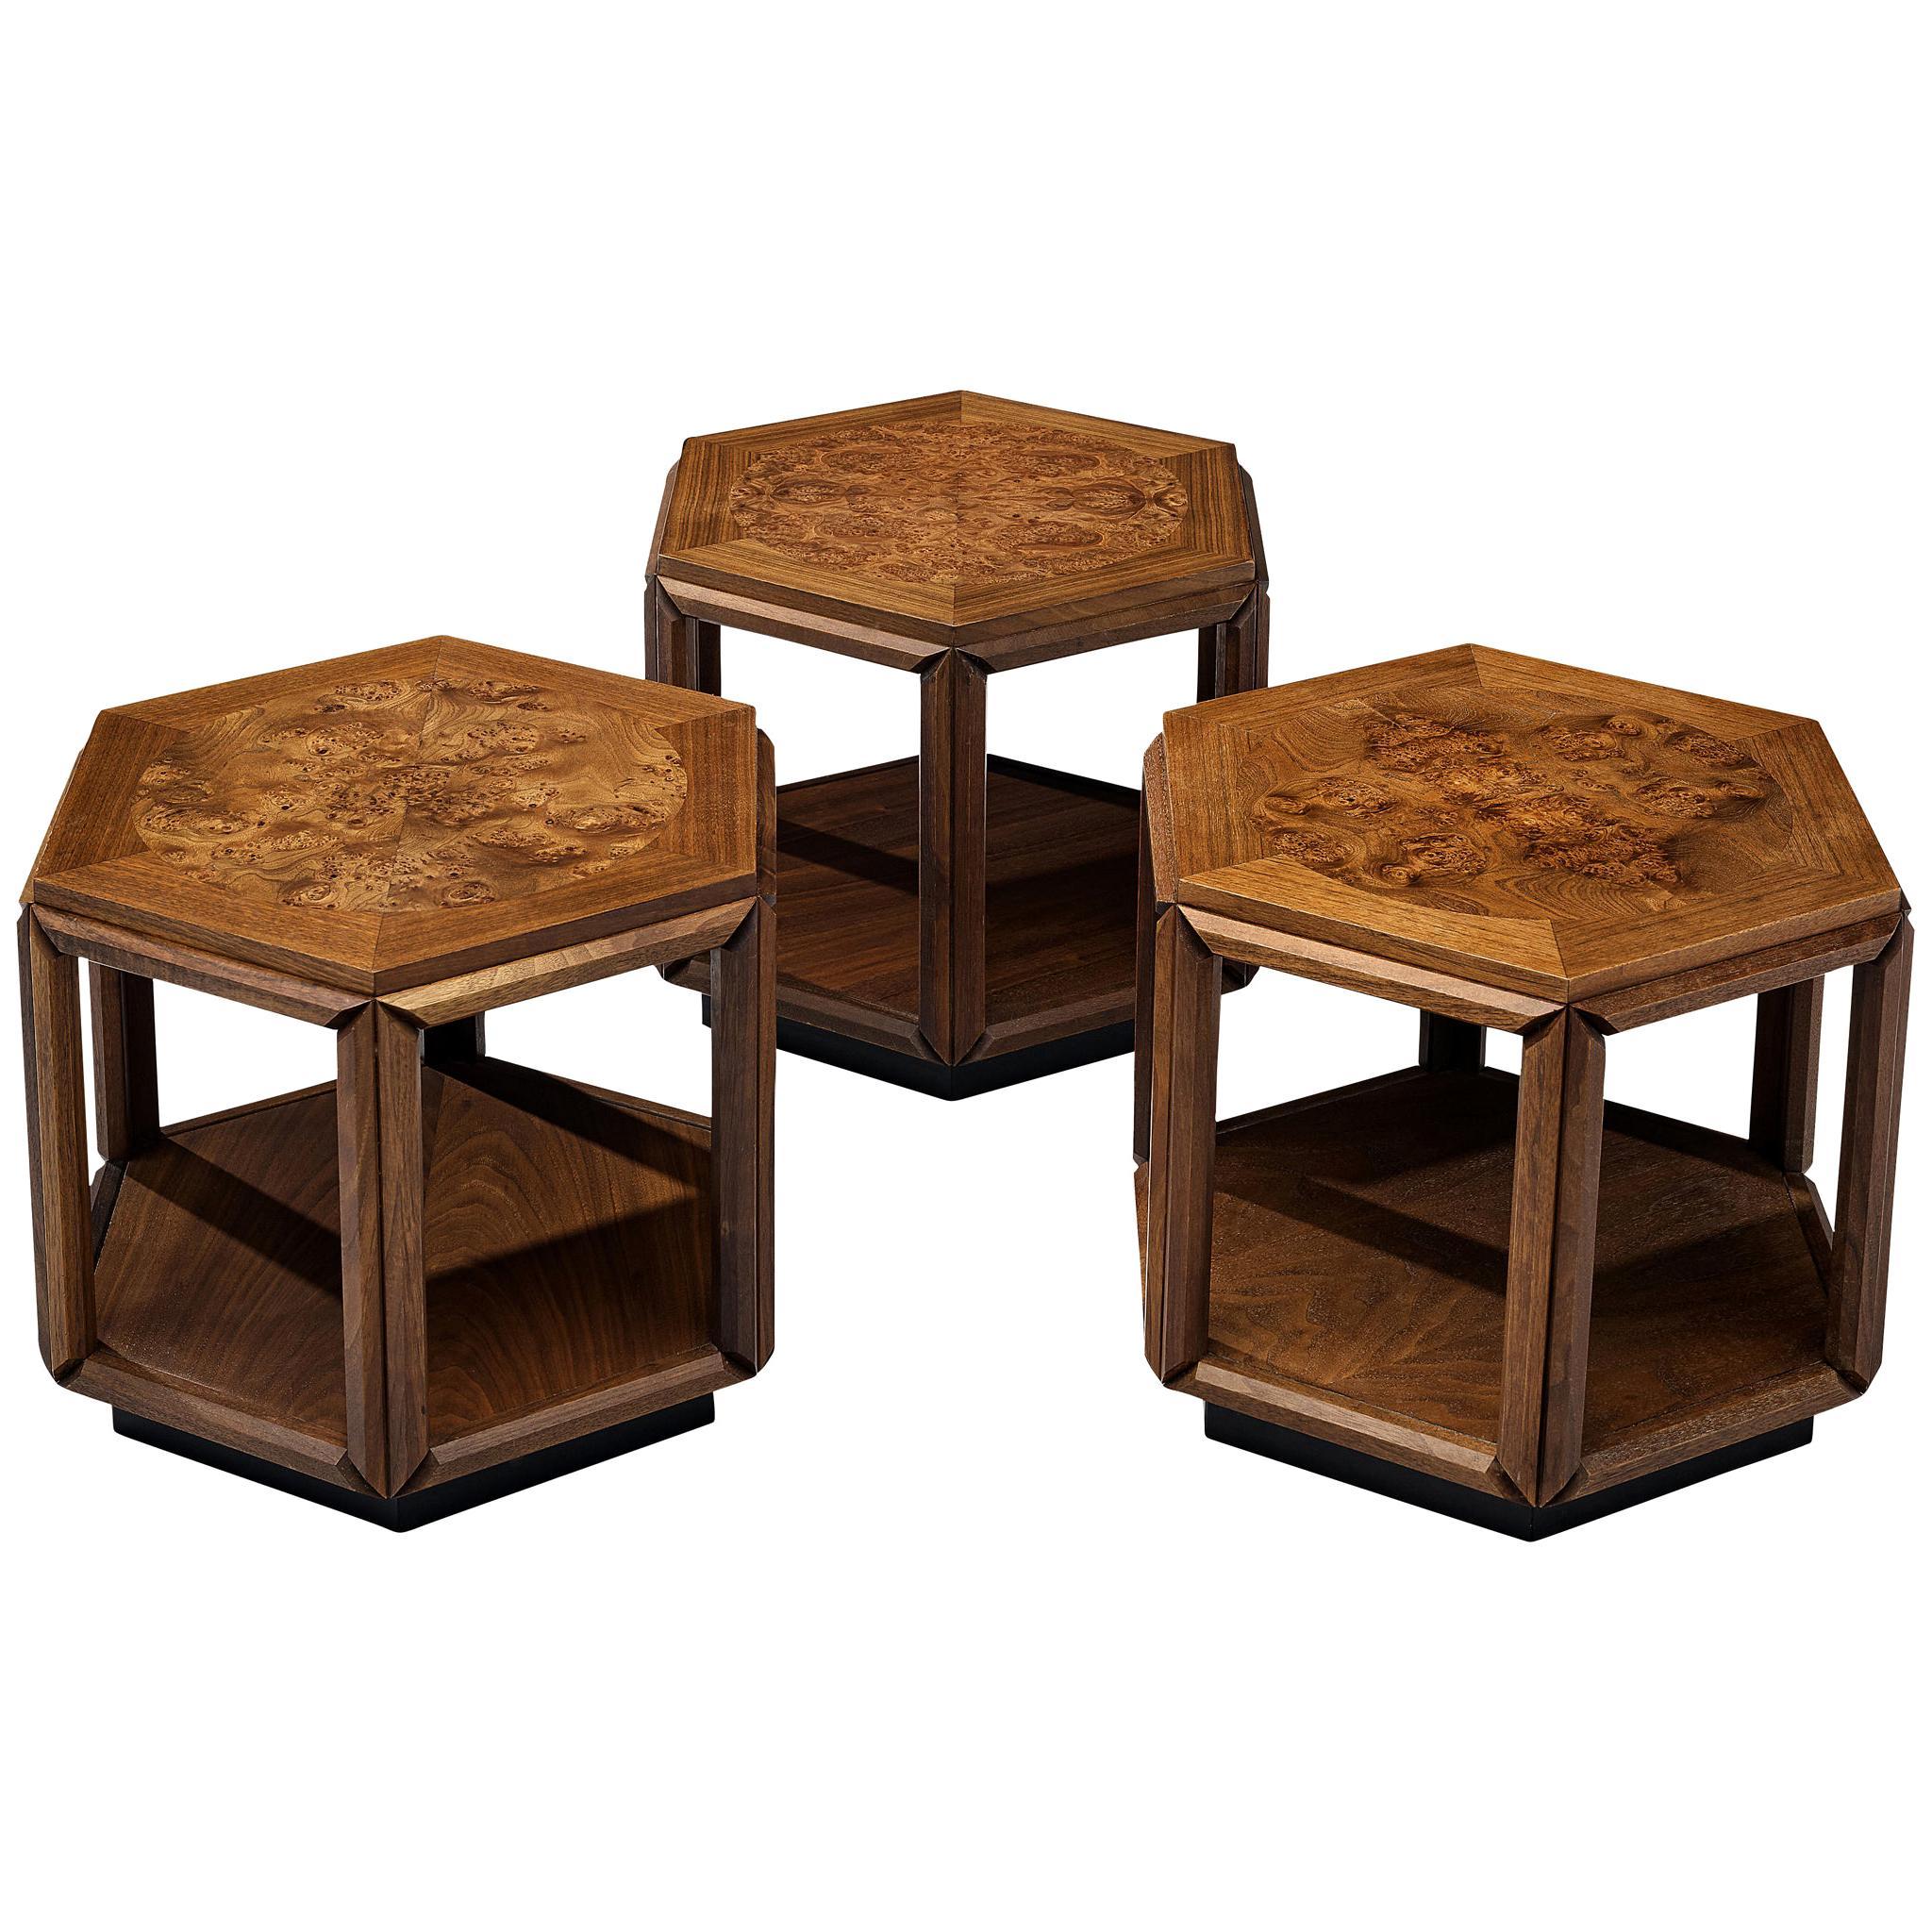 John Keal for Brown Saltman Three Hexagonal Coffee Tables in Walnut